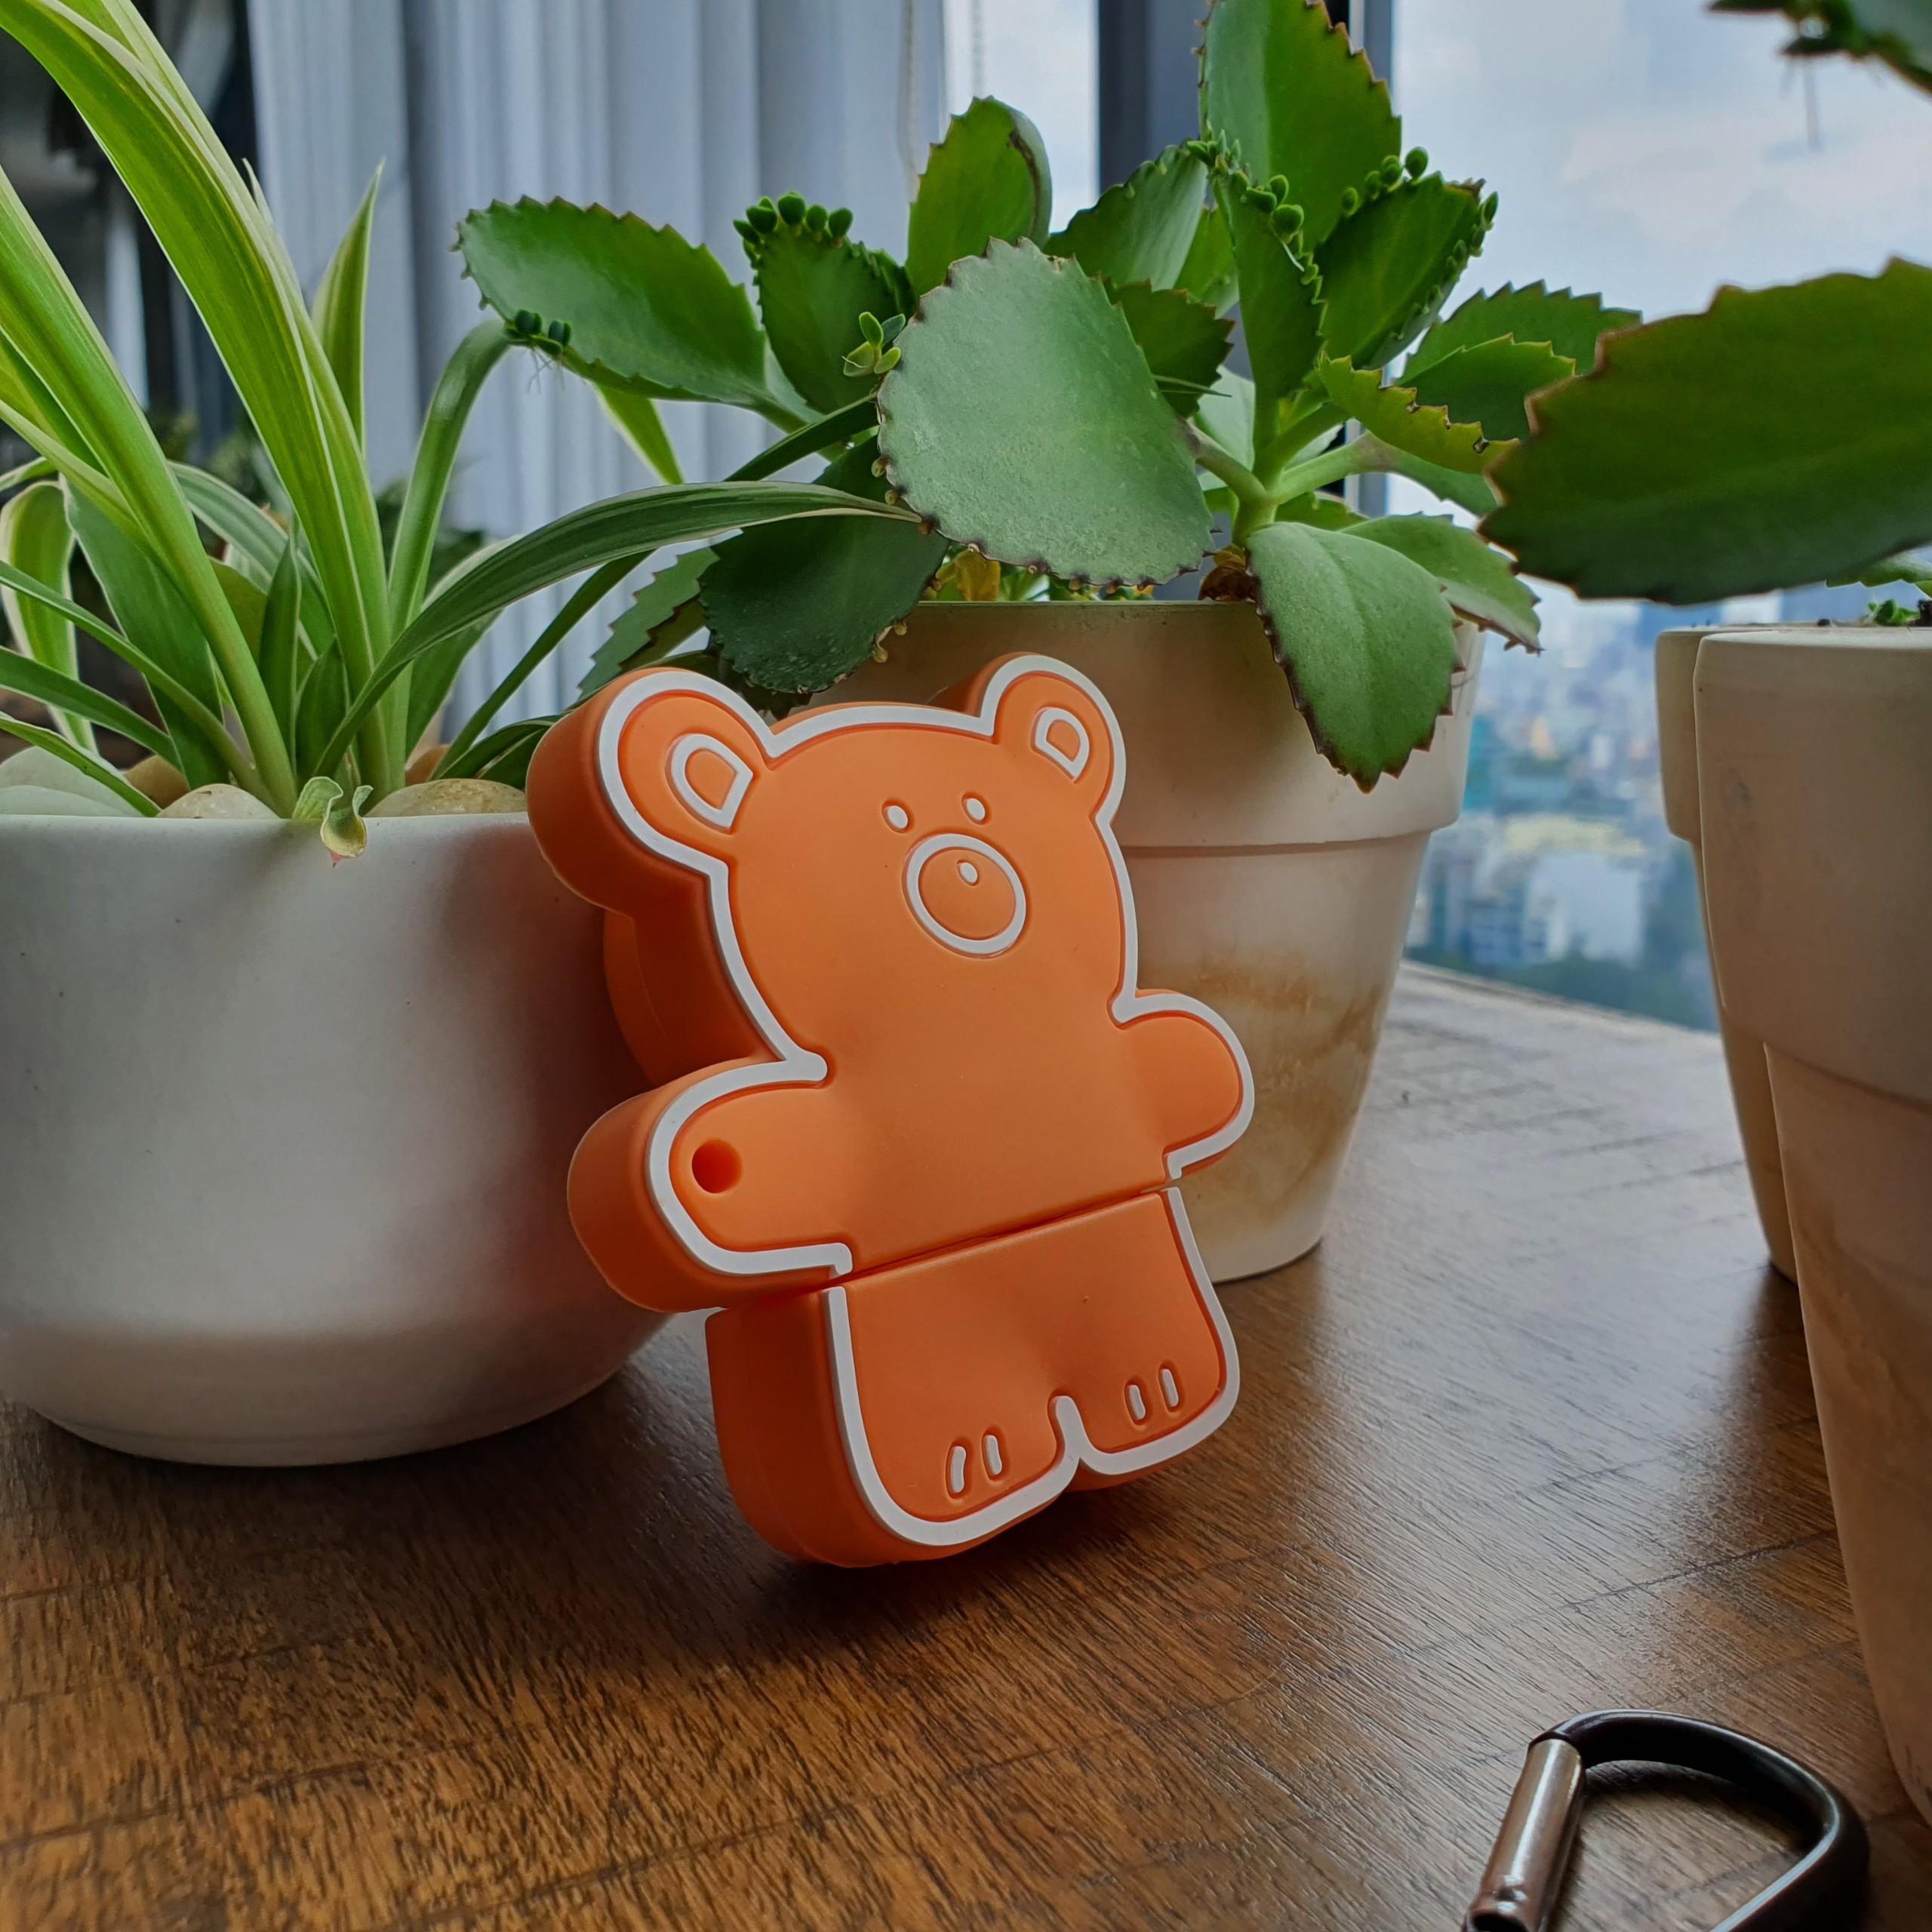 Bao Case Silicon Cho Tai Nghe Apple AirPods 1 / AirPods 2 -  Hình Gấu Màu Cam